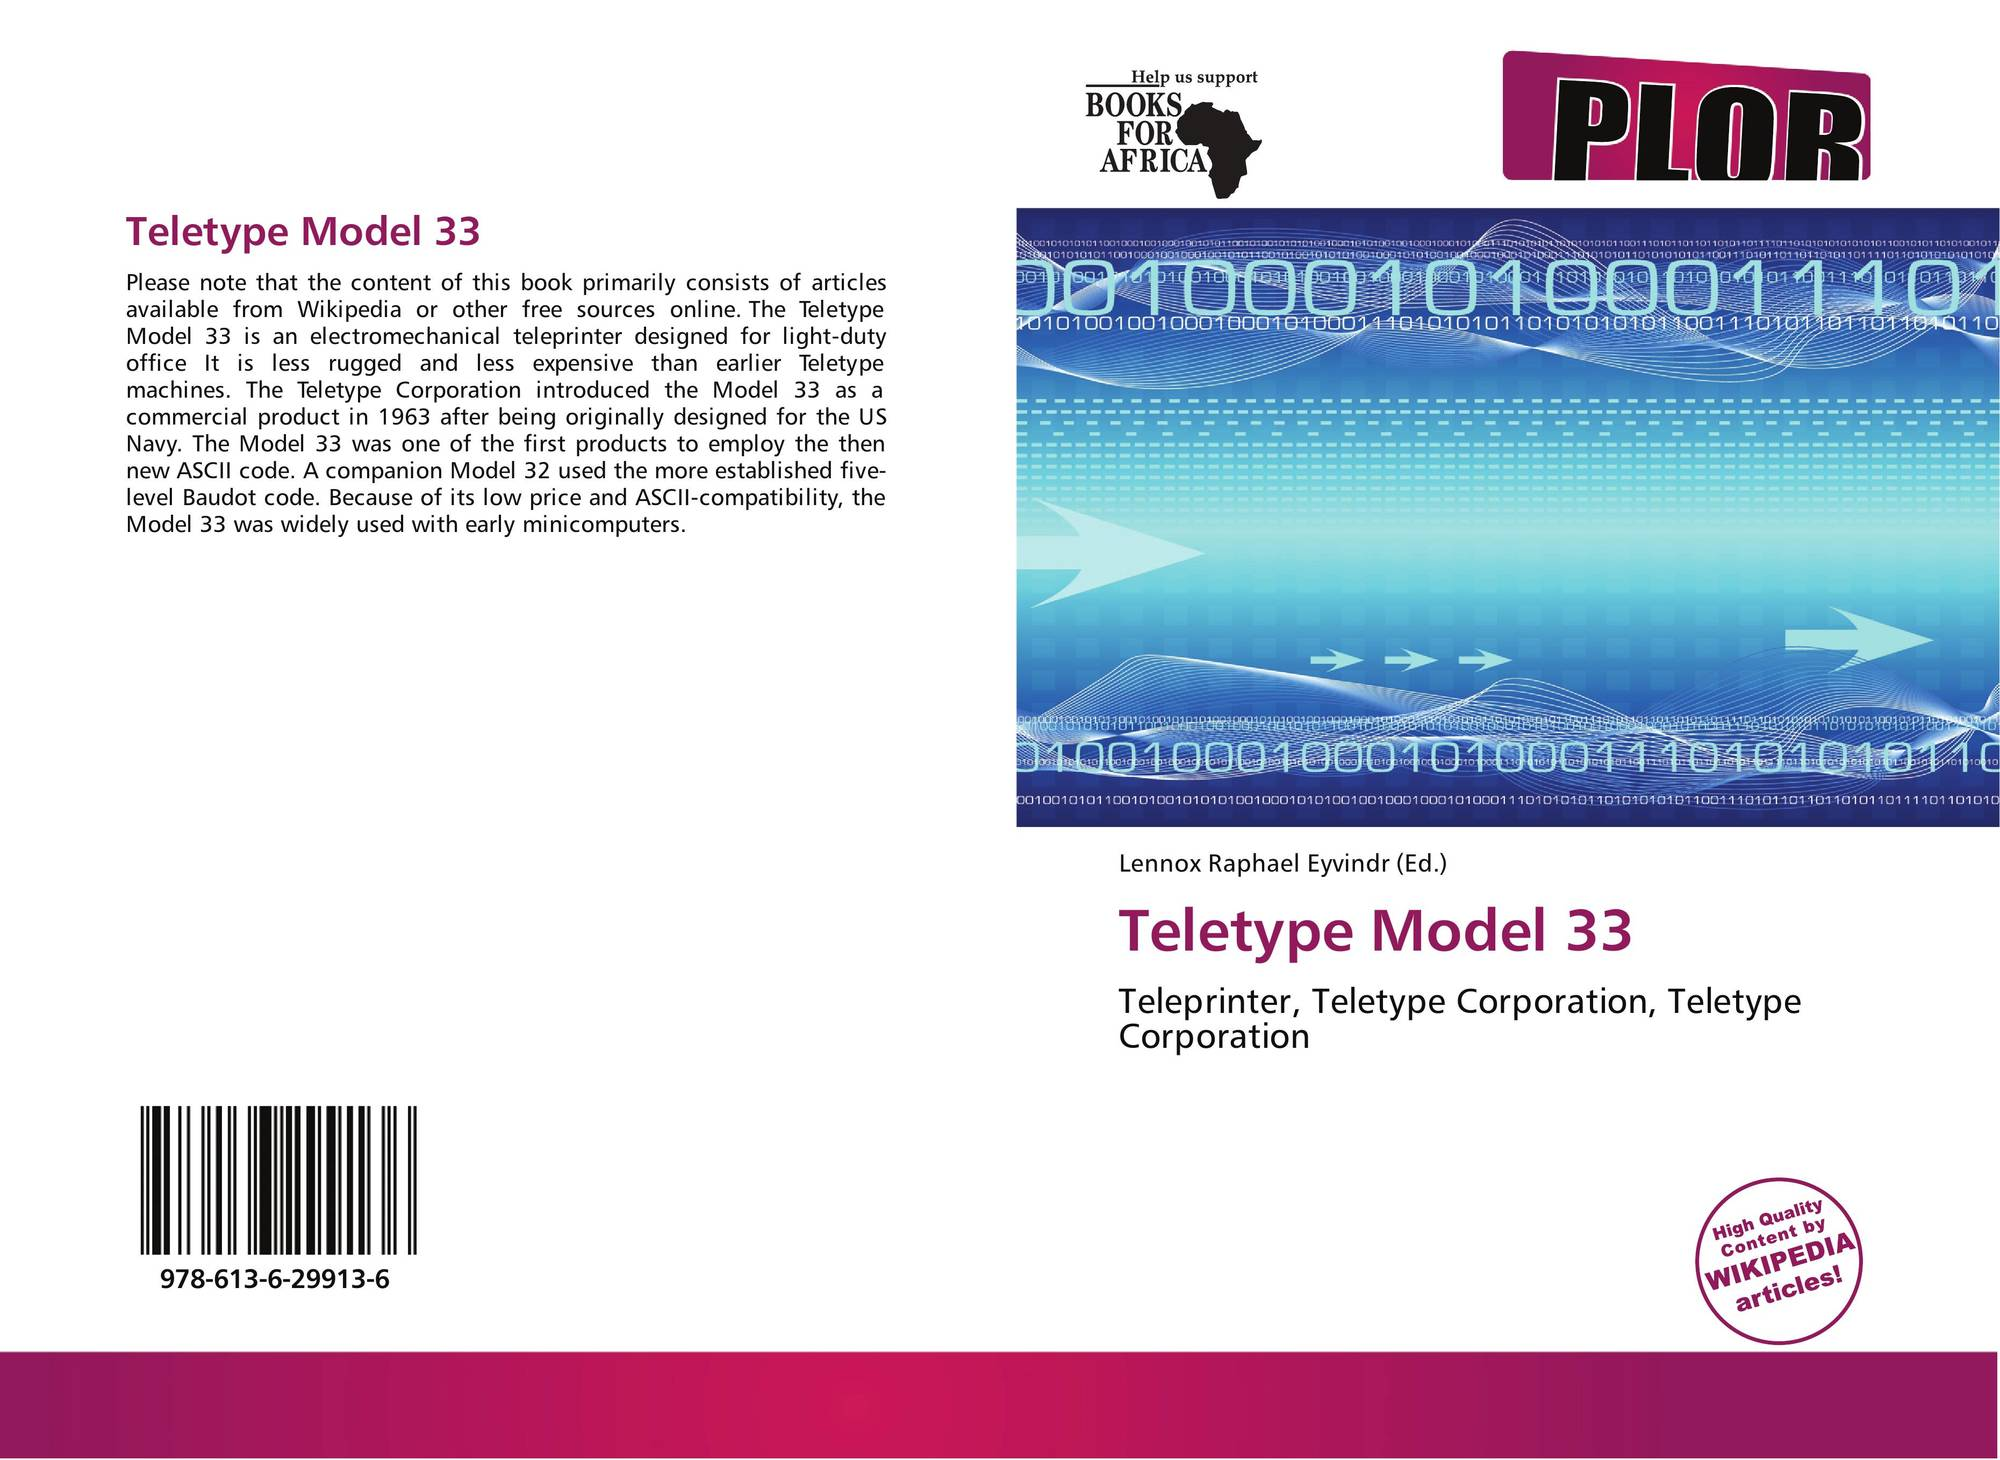 model multinational company